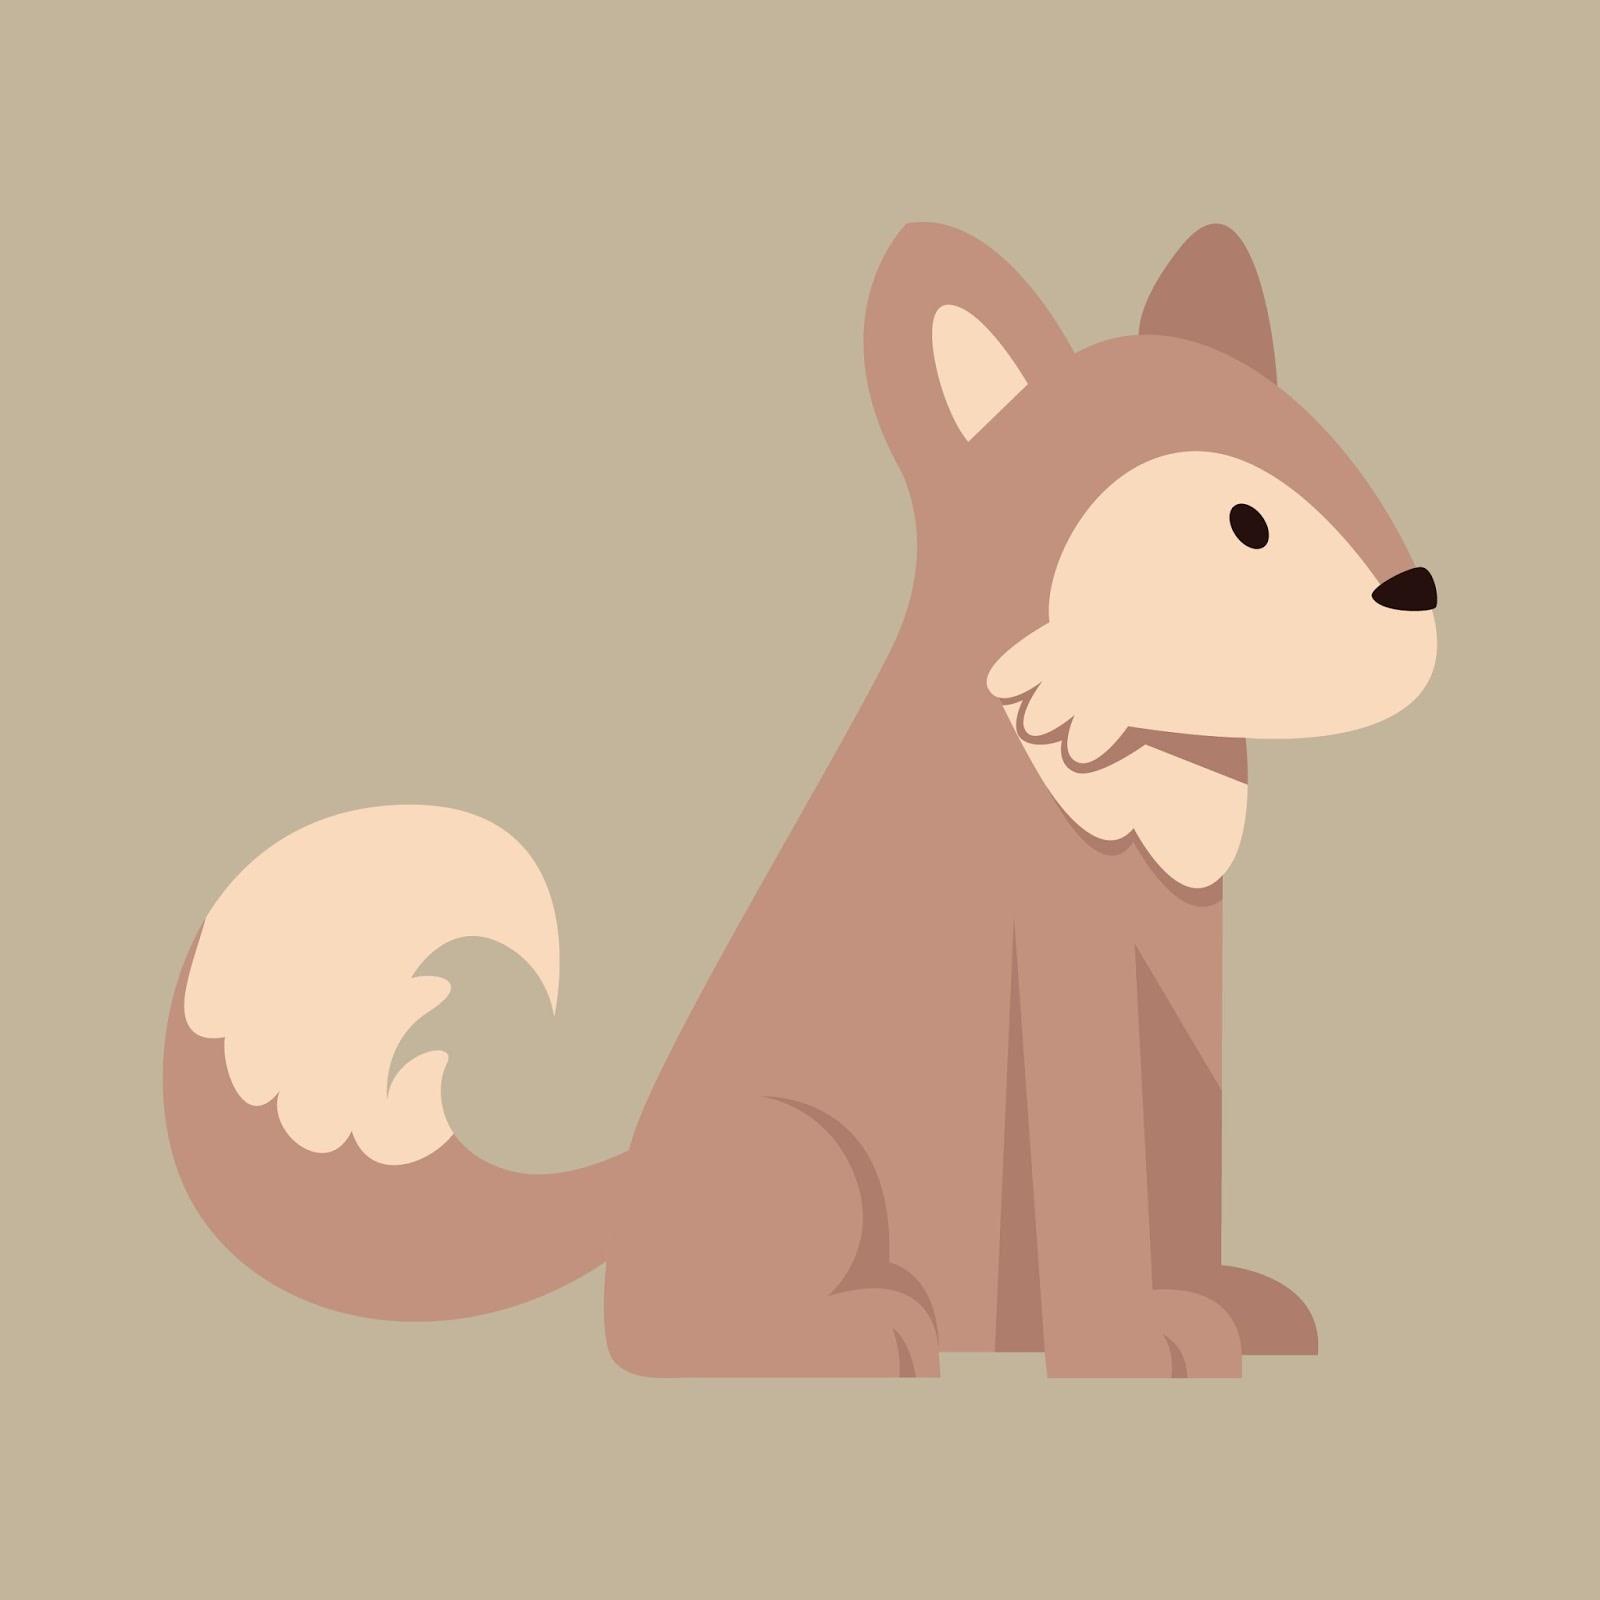 medium resolution of clipart clip art cute dog vector free download husky dog